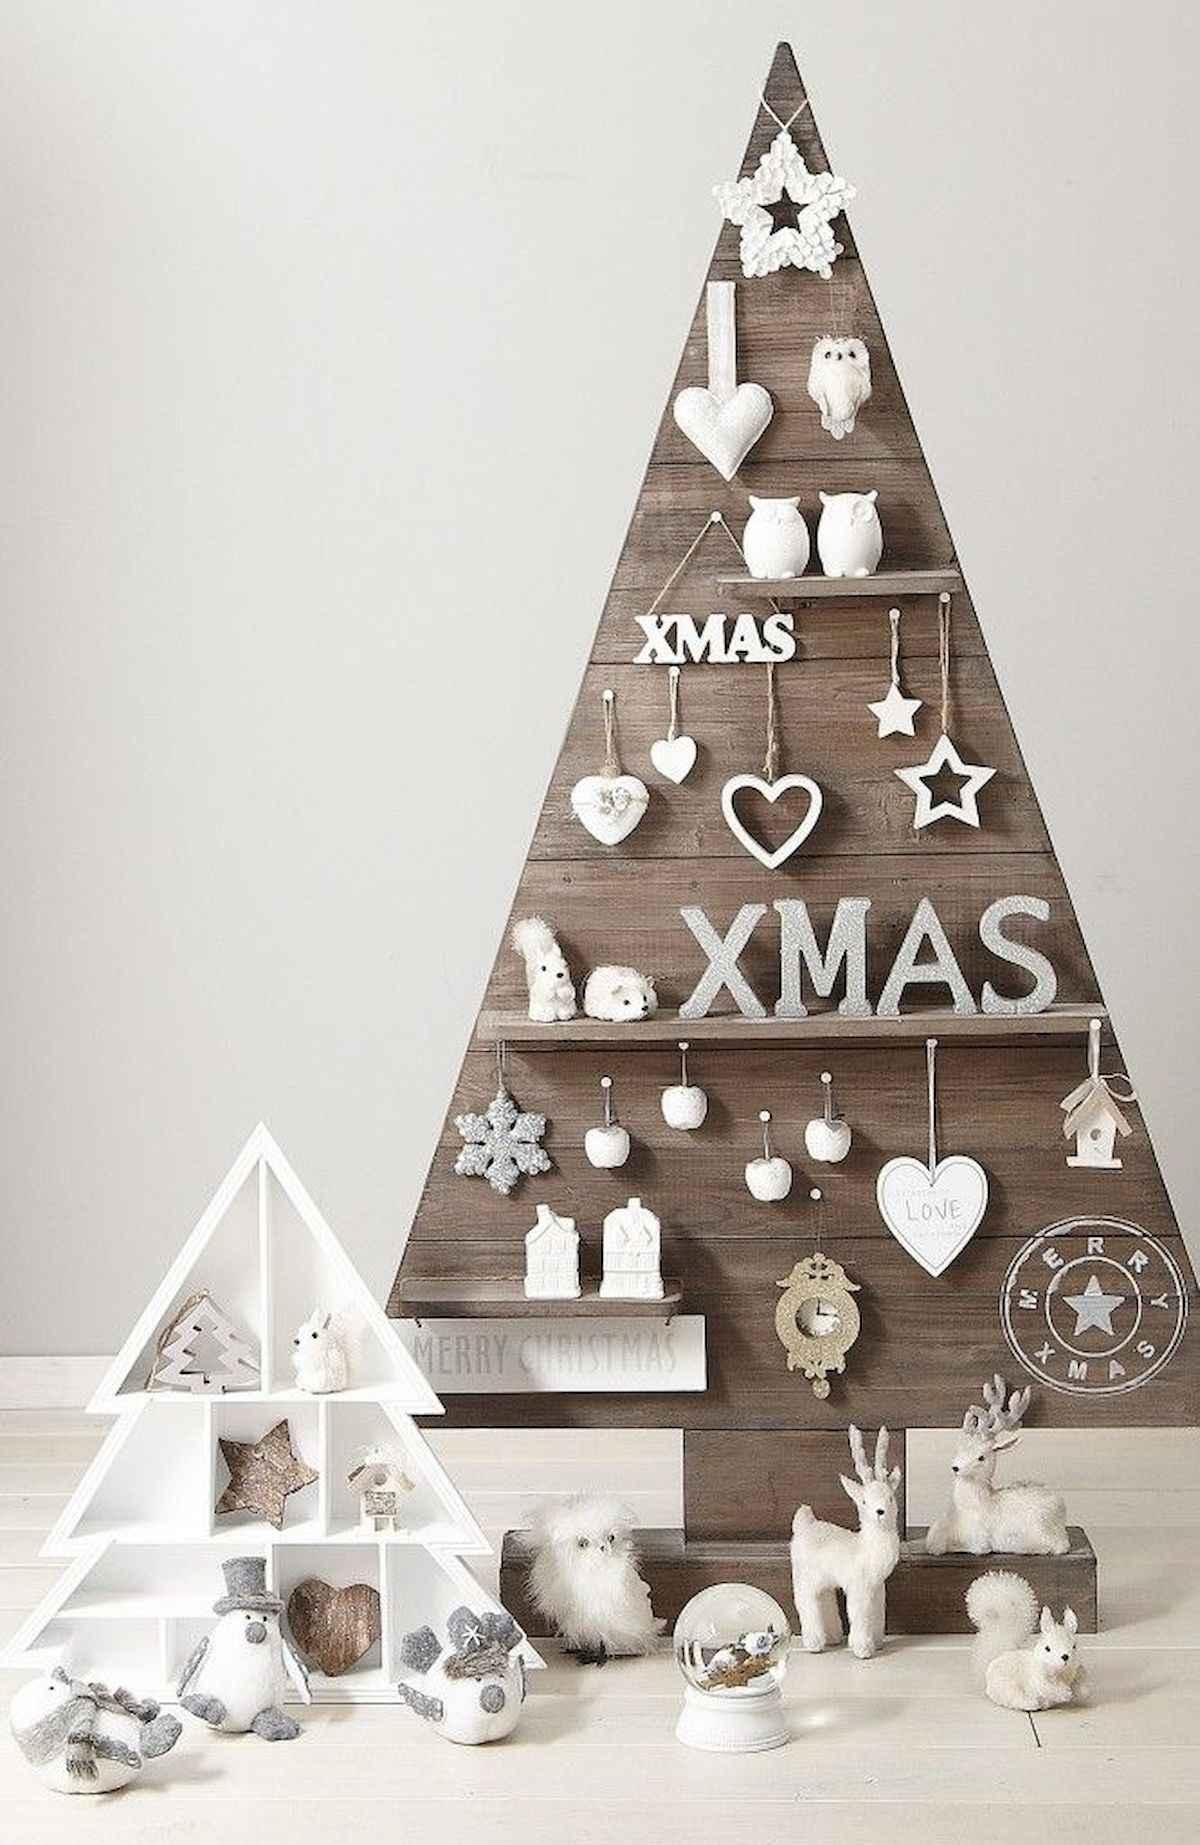 50 diy christmas decorations ideas (25)